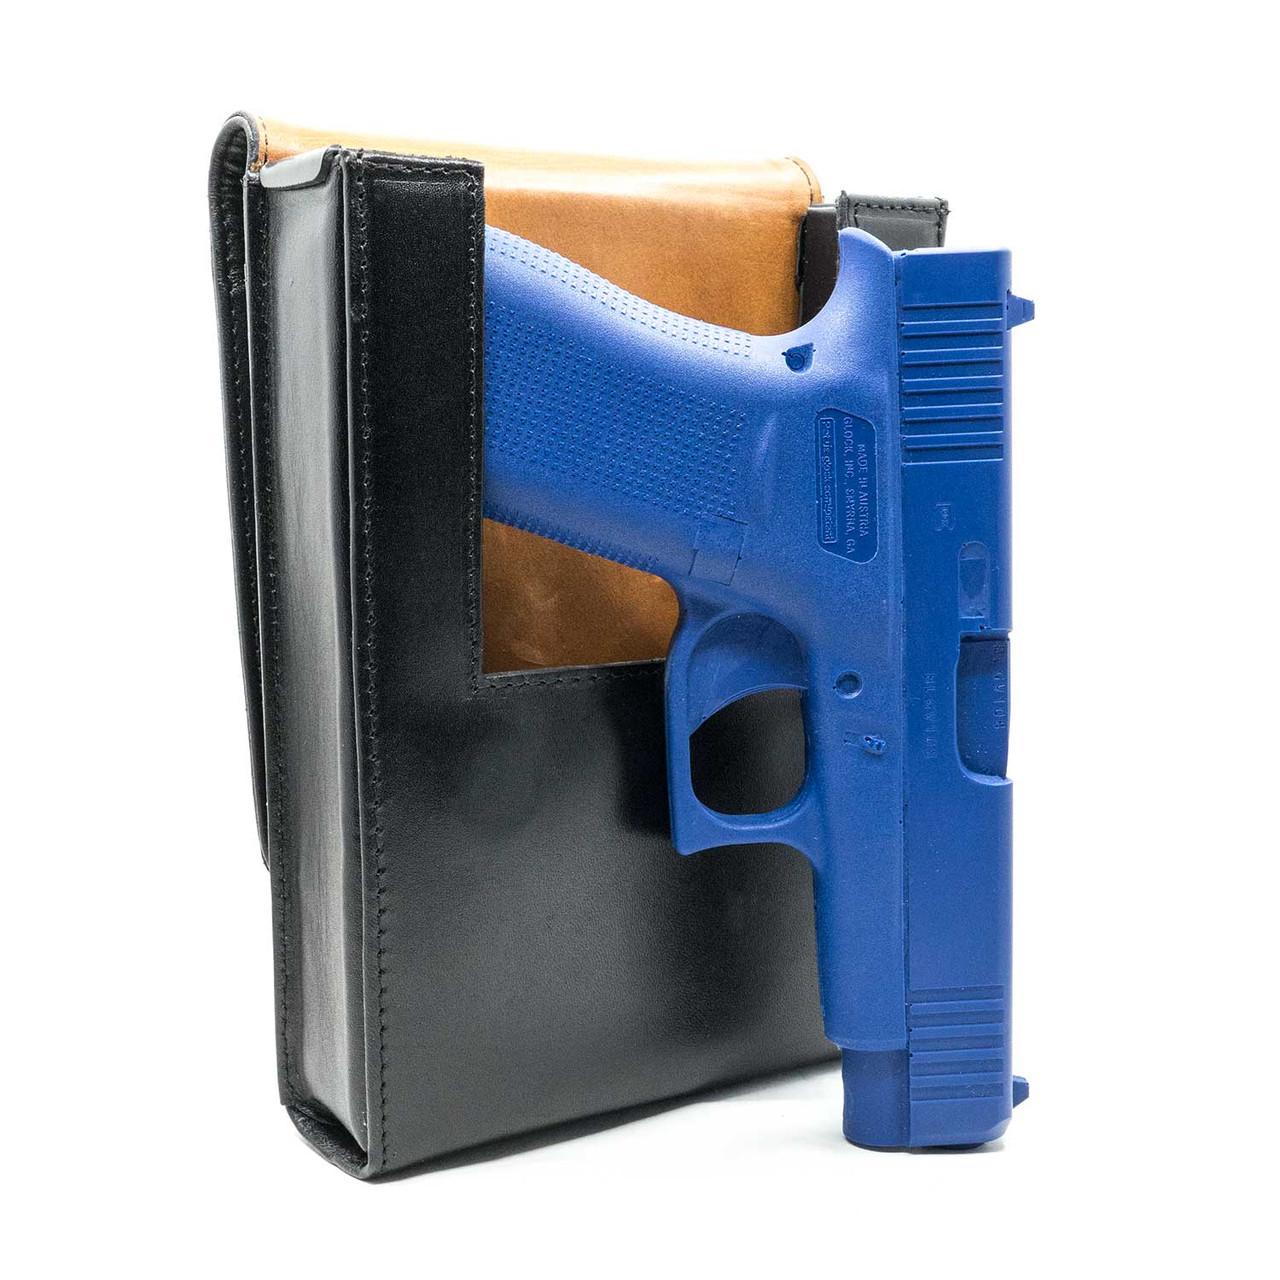 Glock 48 Concealed Carry Holster (Belt Loop)